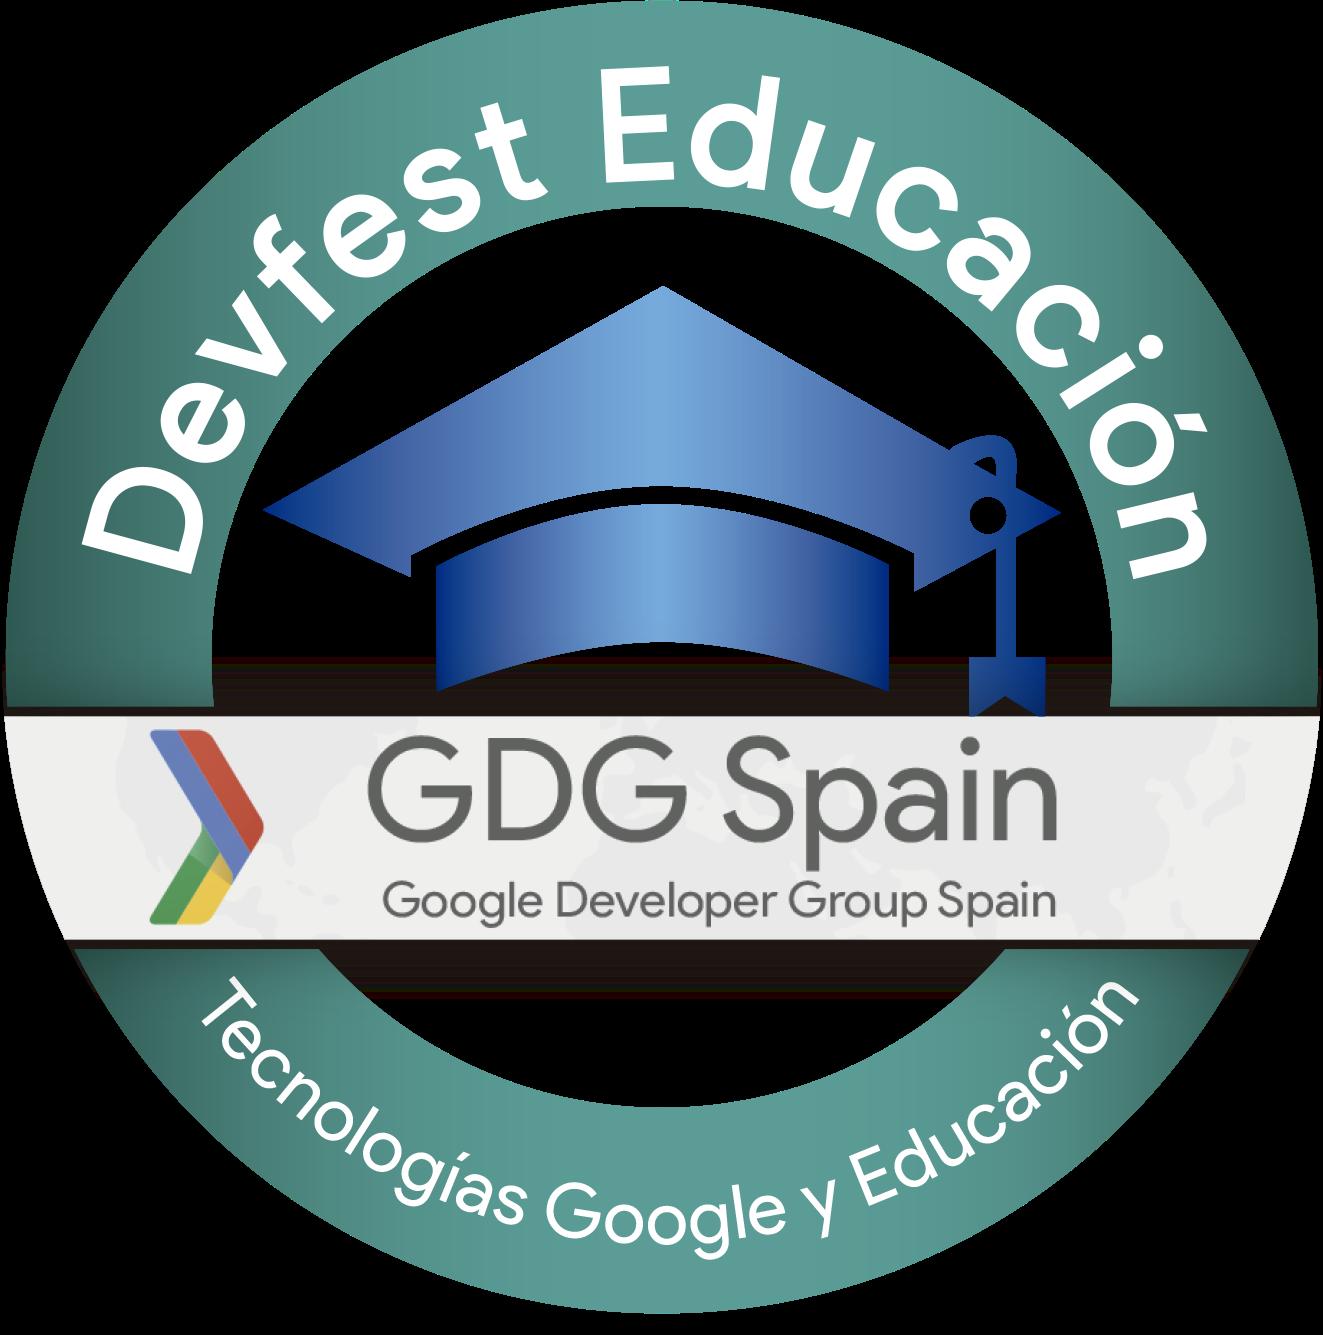 Pasó: Devfest Educación Tenerife